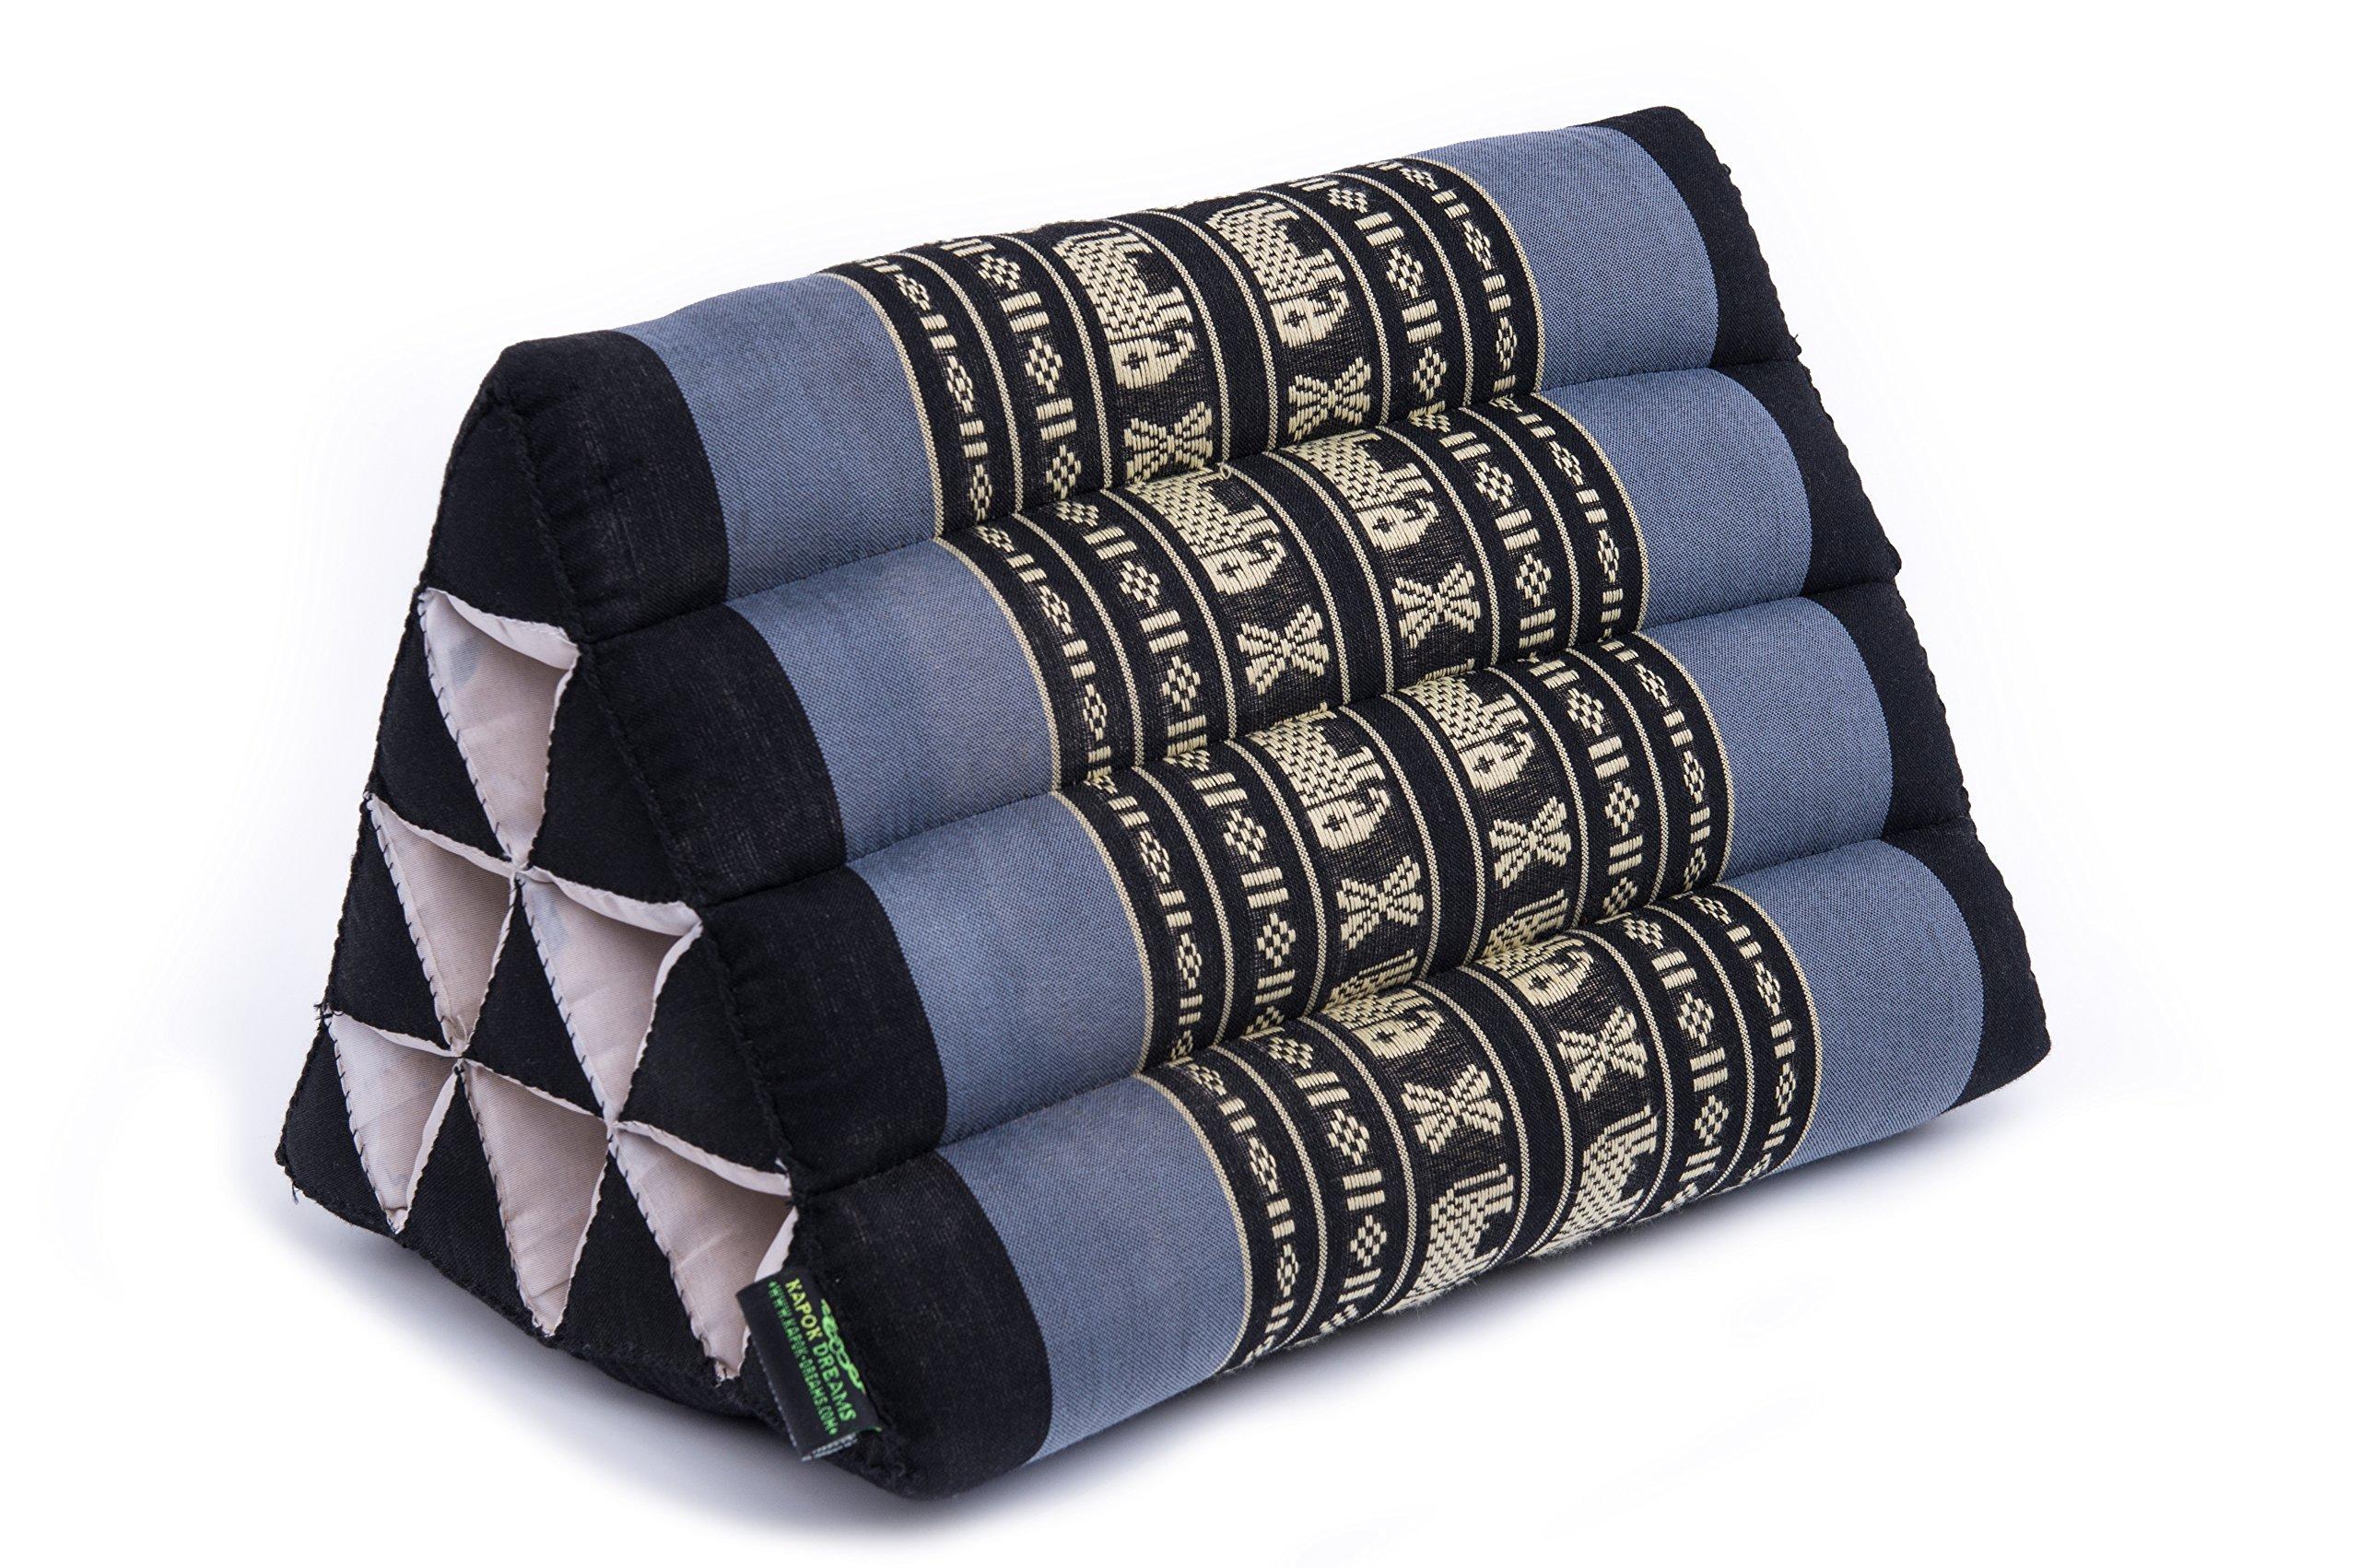 Kapok Dreams Thai Triangle Pillow 13''x8'', Triangular Cushion (Medium Size), 100% Kapok-Stuffing, Blue Elephants. by Kapok Dreams